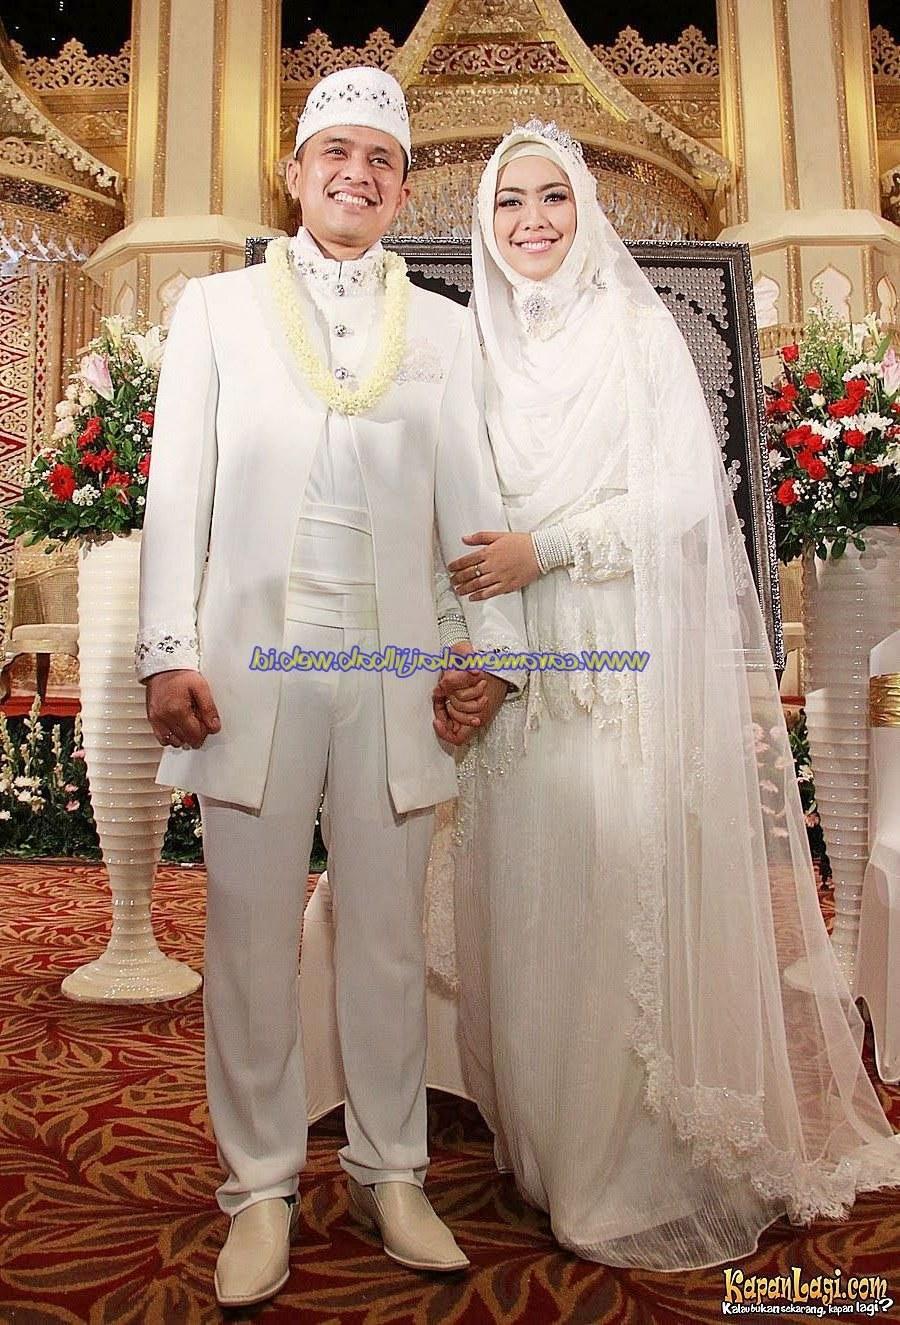 Model Baju Pengantin Muslimah Syar'i 0gdr Baju Pengantin Muslimah Modern Terbaru 17